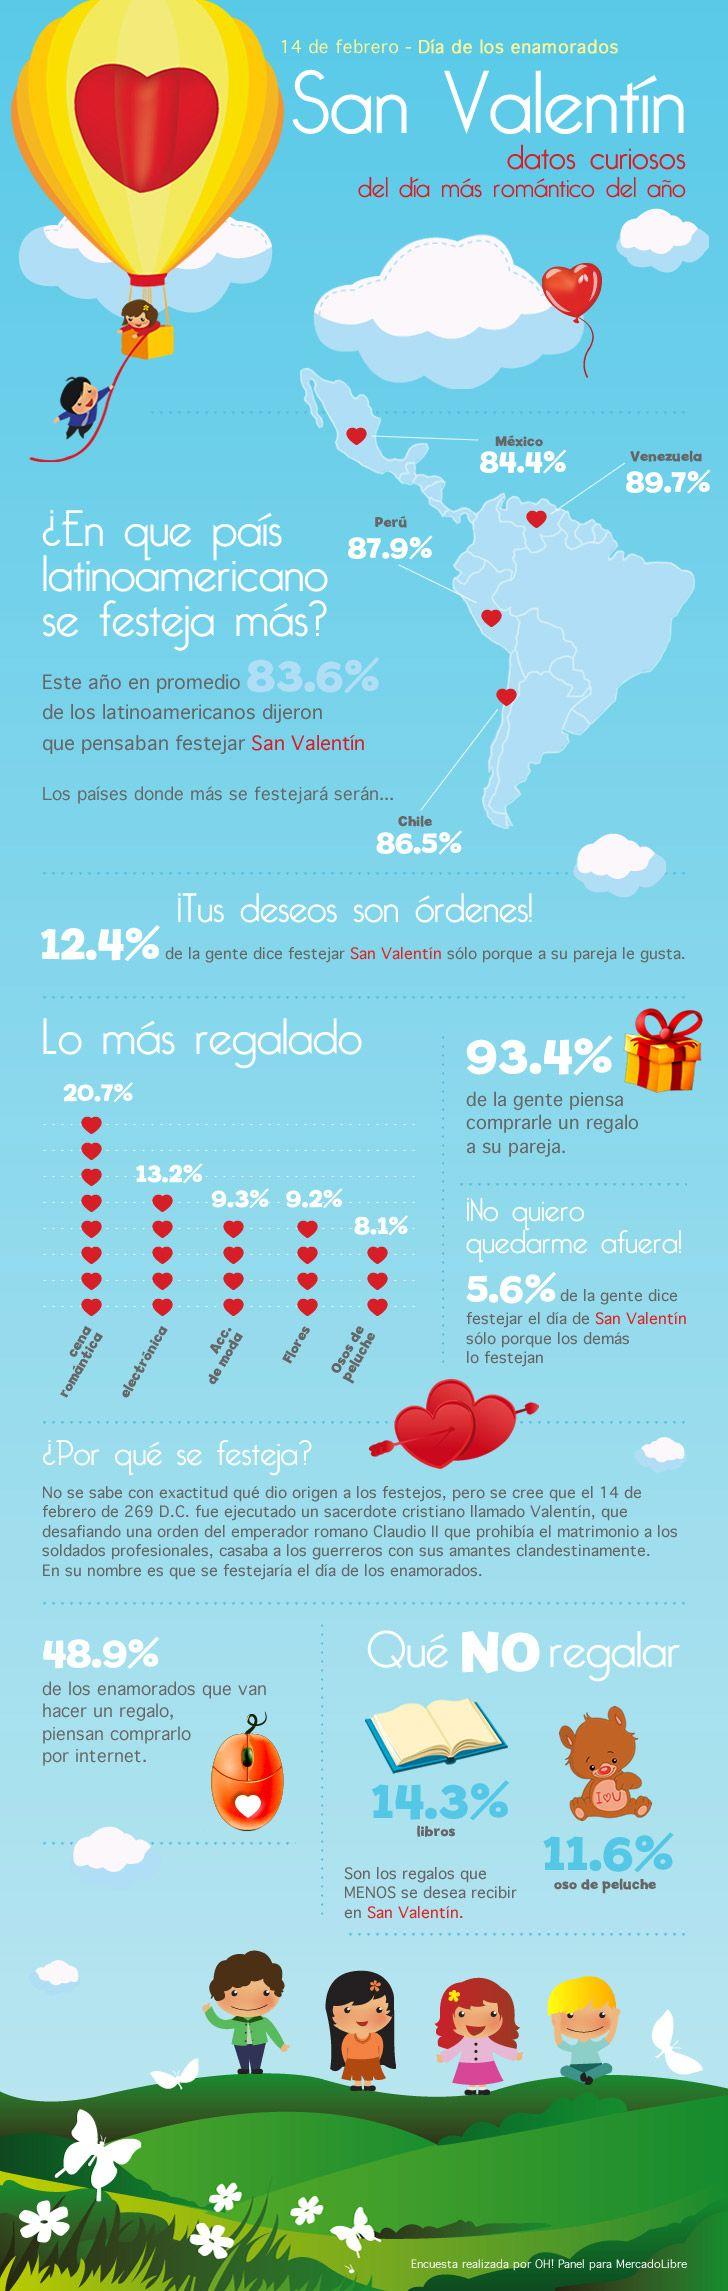 http://www.mercadolibre.com/org-img/mkt/natural/infografias/Infografia-San-Valentin.jpg